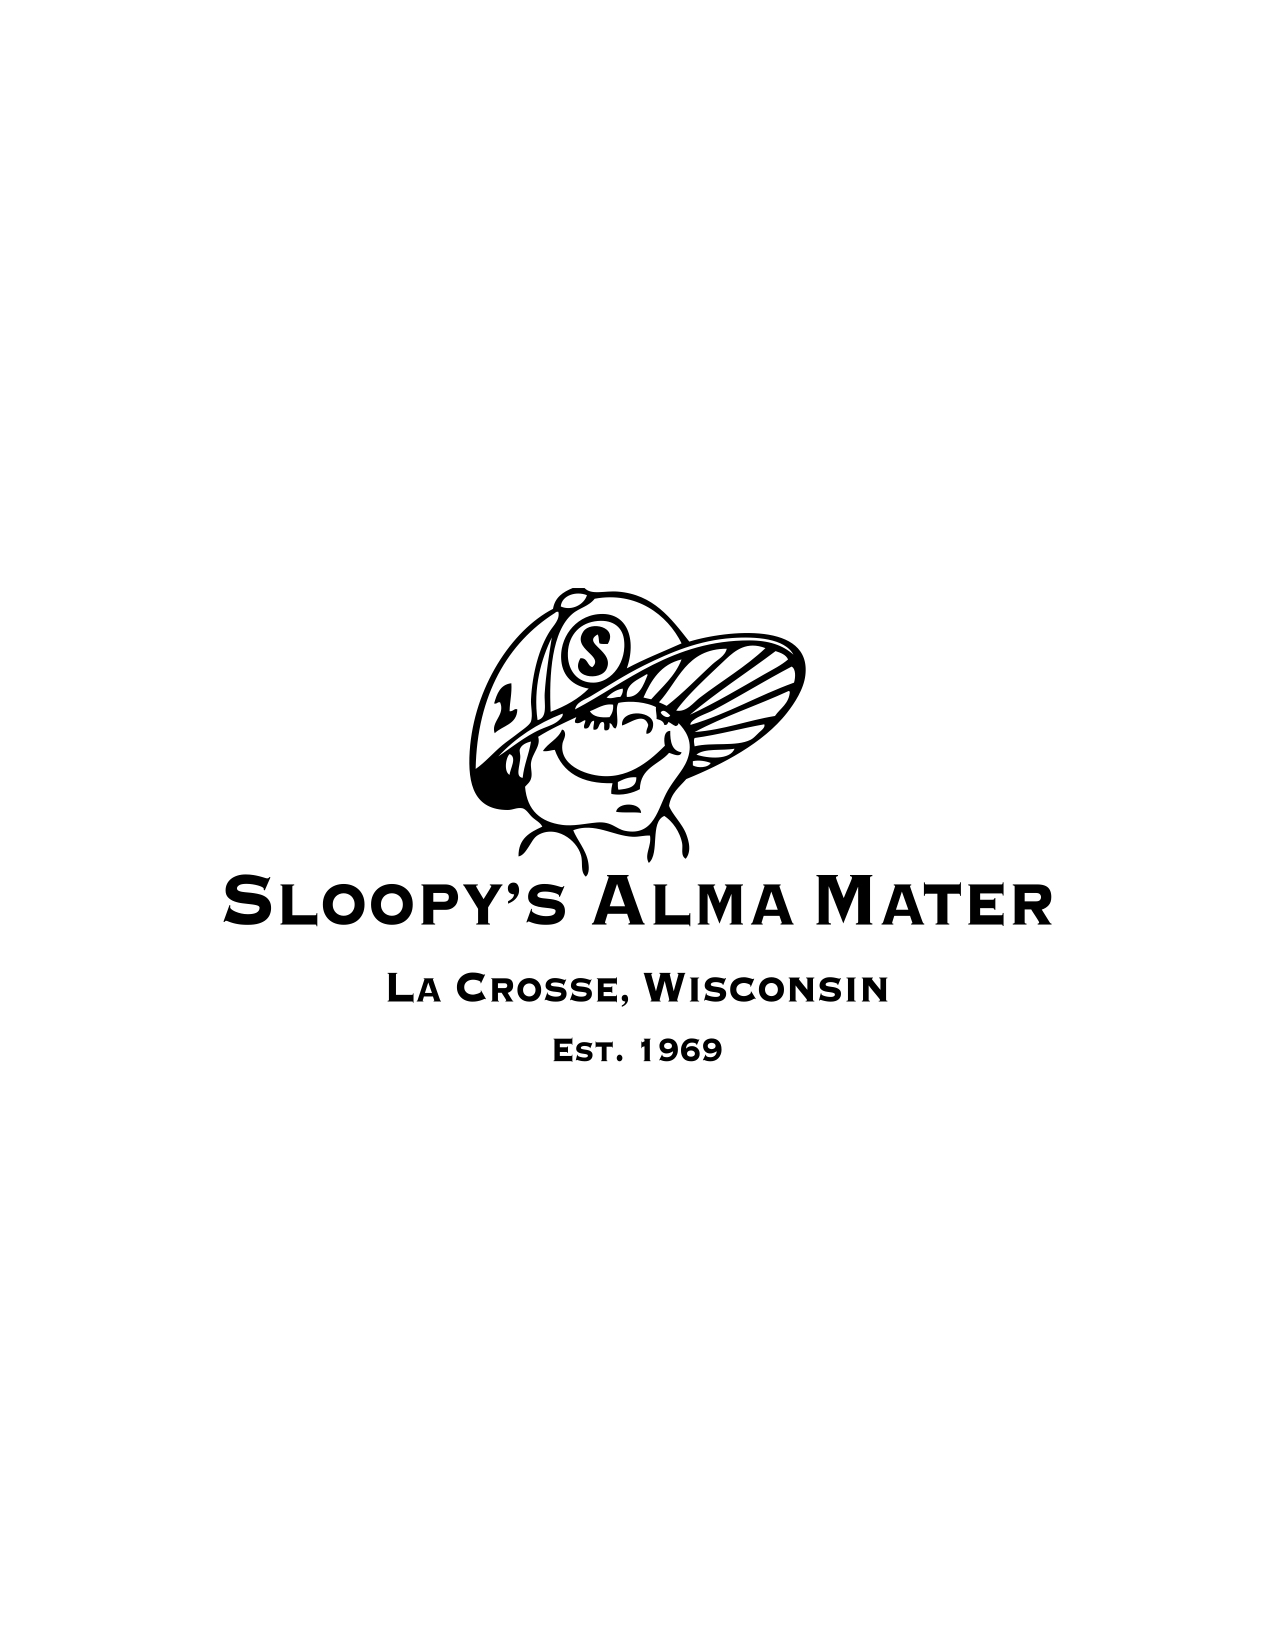 Sloopy's Alma Mater Logo.jpg